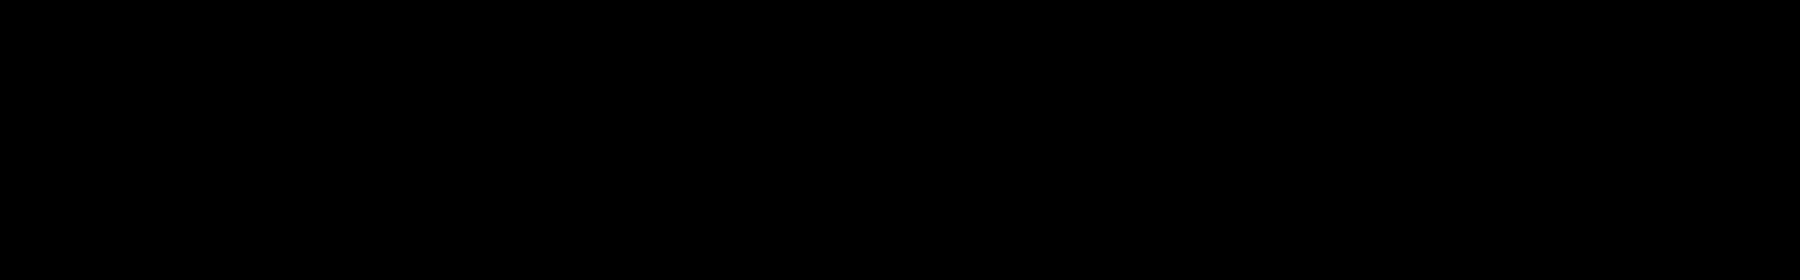 Cosmoworld 2 audio waveform